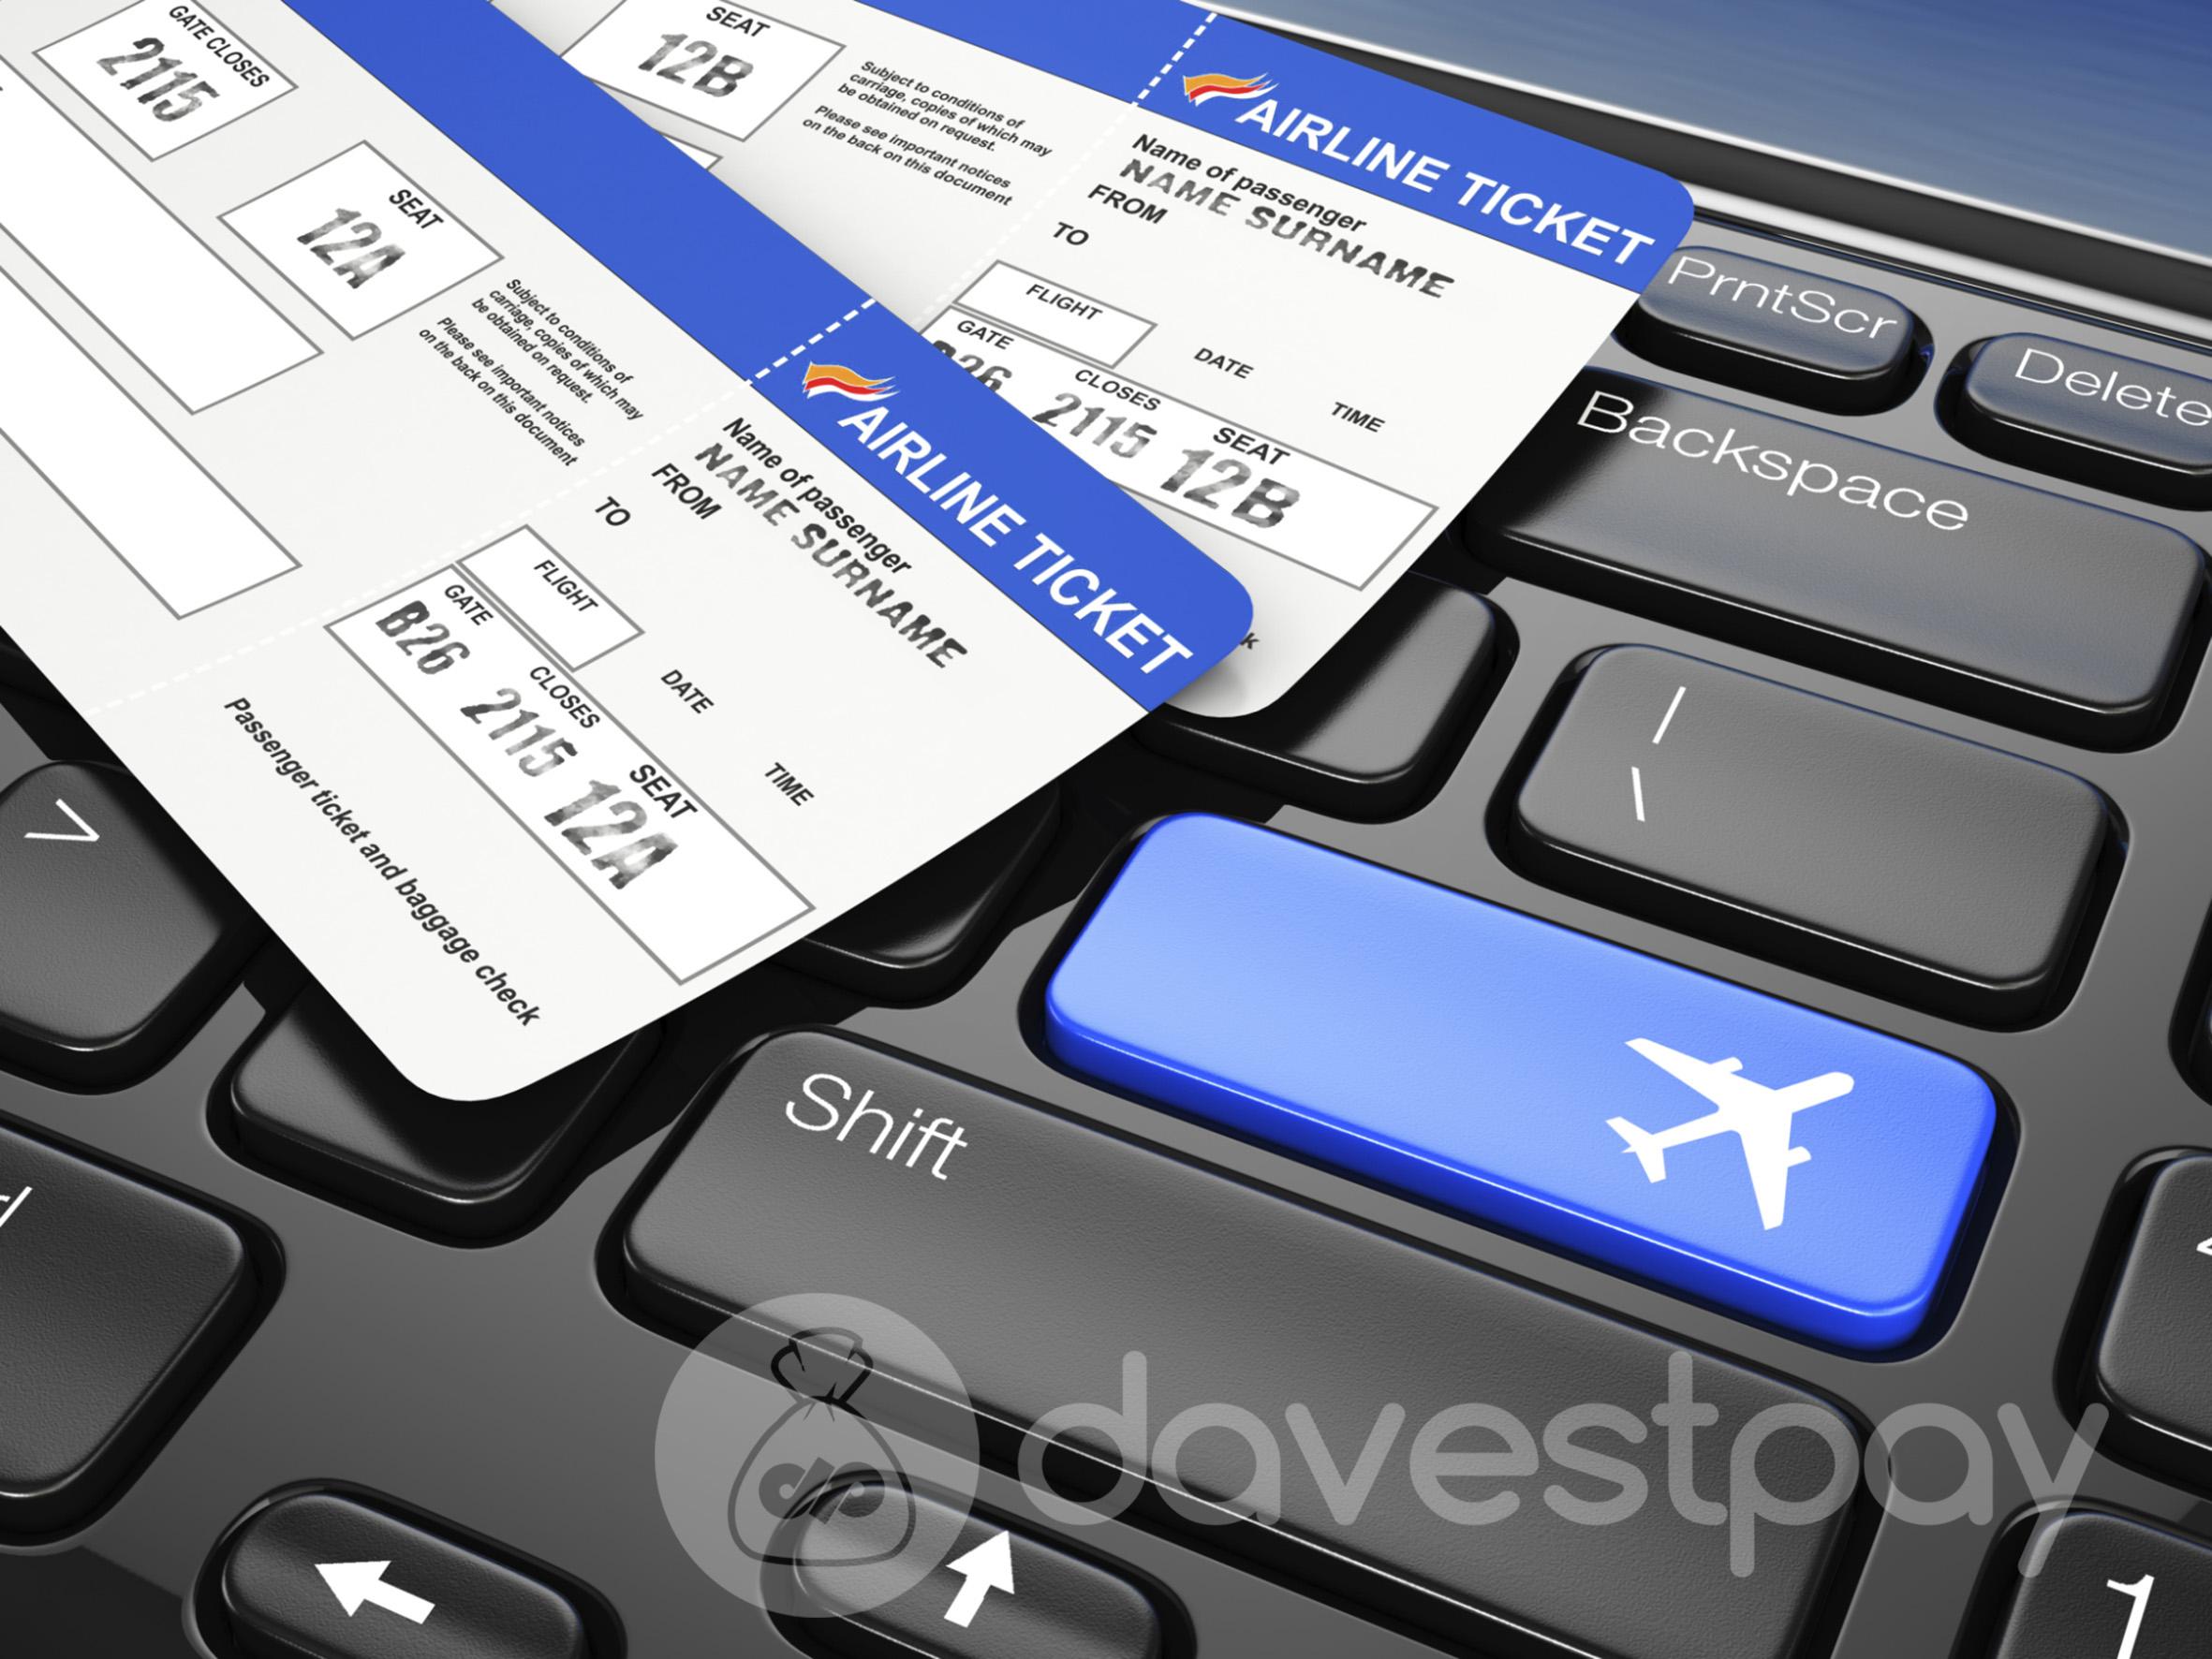 Simak Cara Peroleh Tiket Pesawat Kelas Satu Dengan Harga Murah